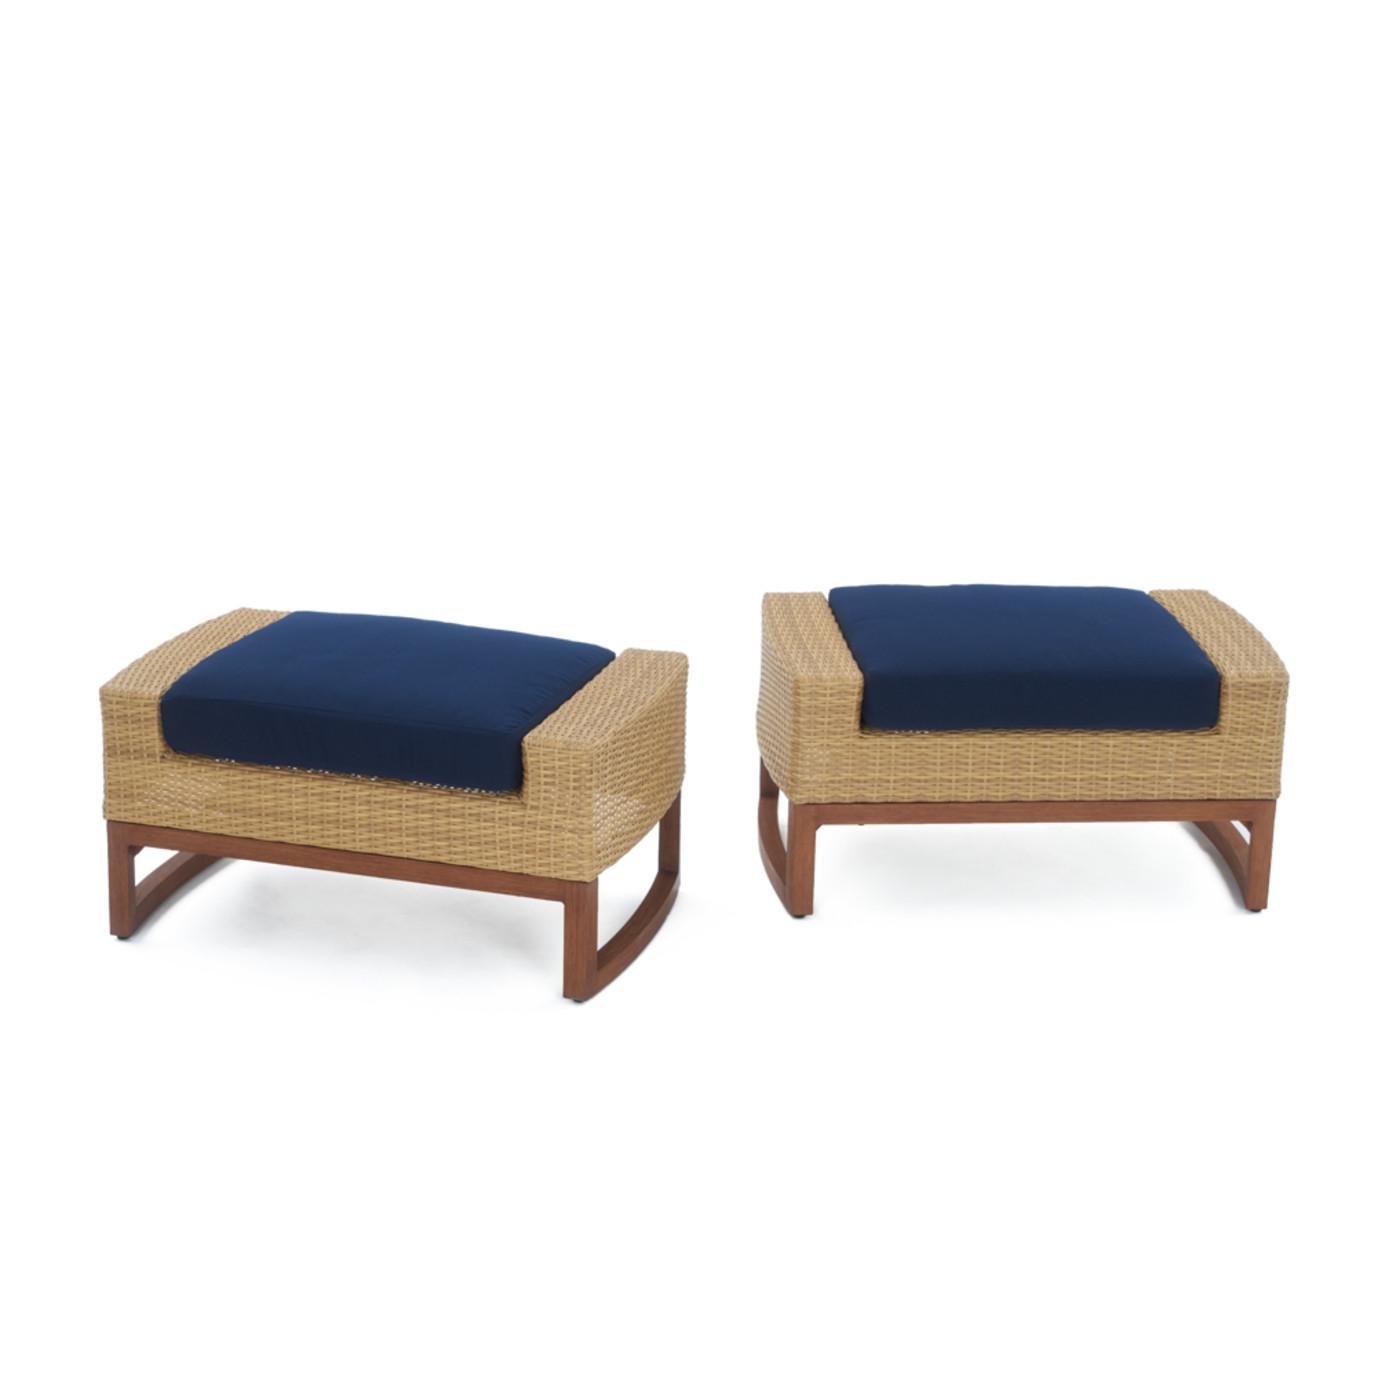 Mili™ 5pc Club Chair & Ottoman Set - Navy Blue